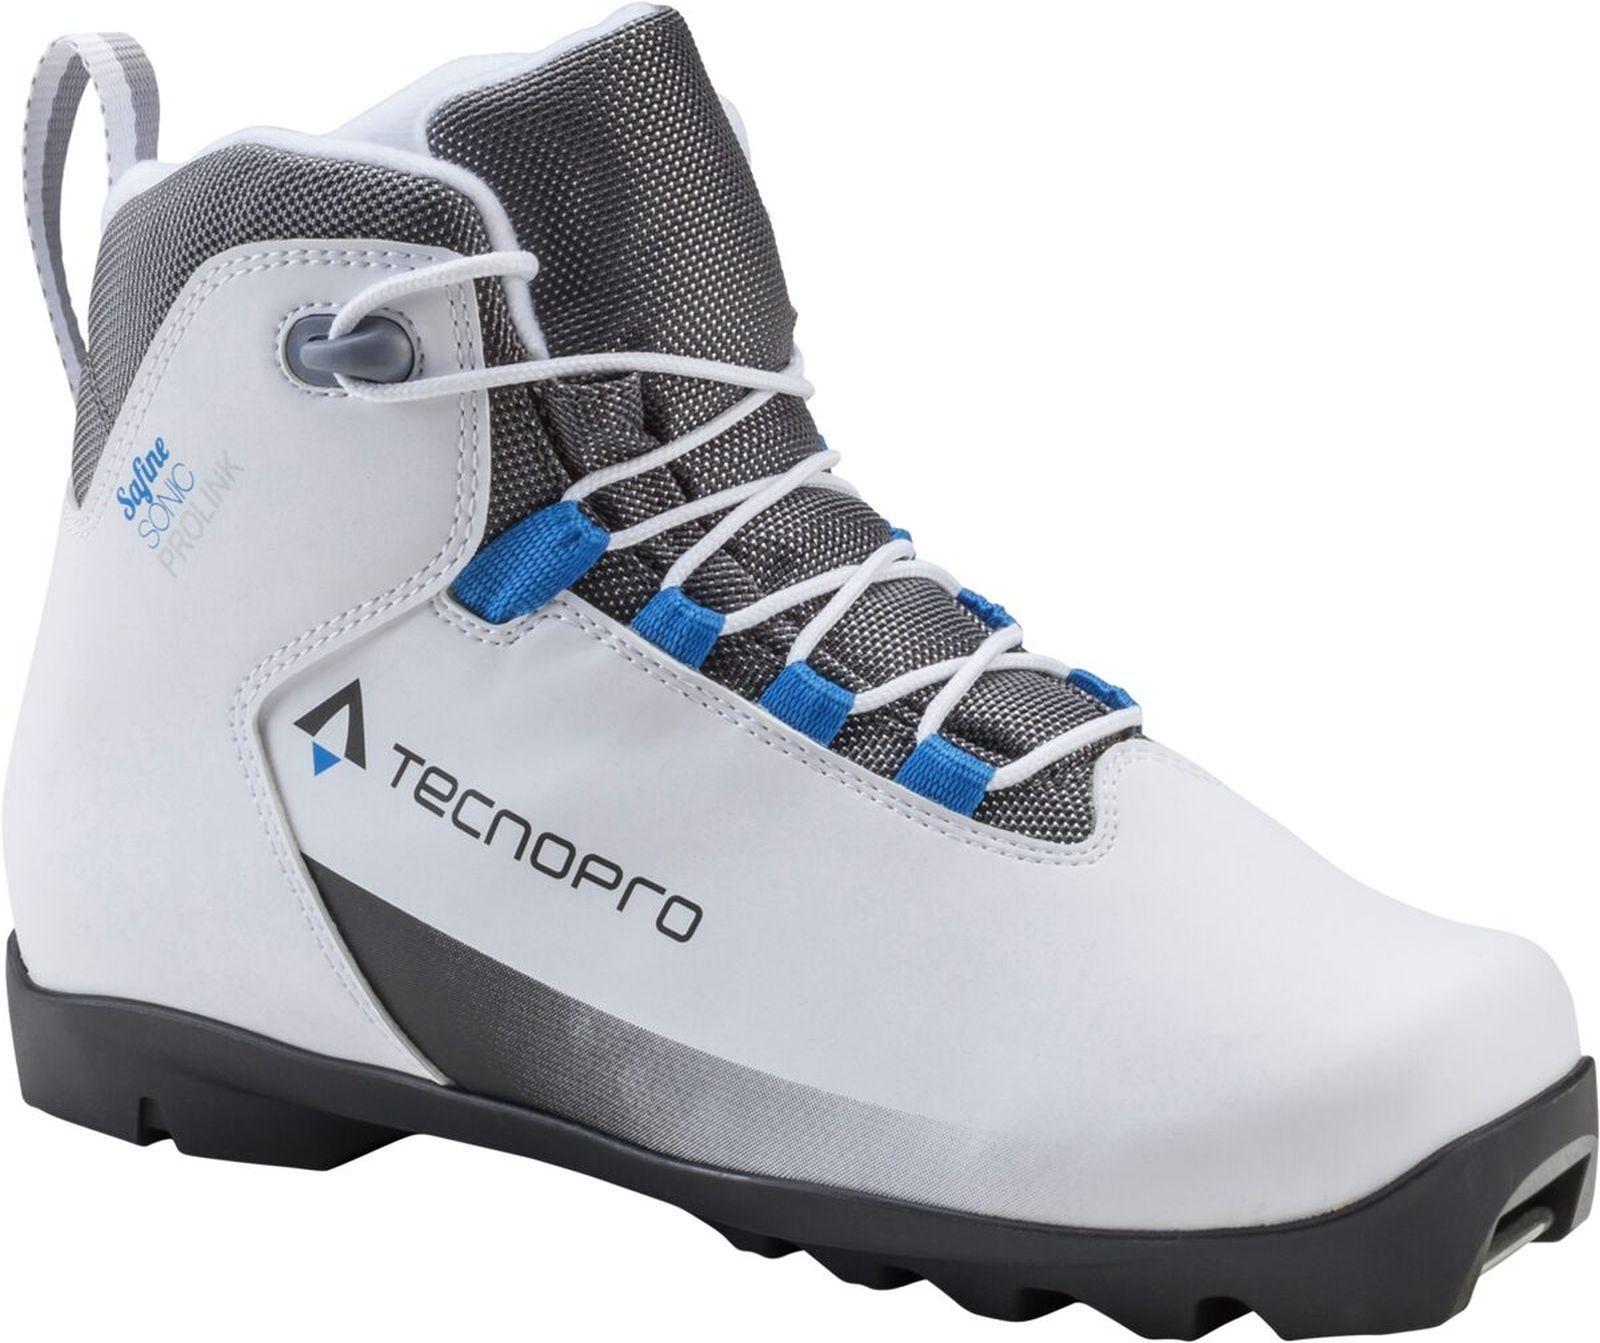 Tecno  pro Ladies cross Country Ski Boots Safine Sonic Prolink Nnn Binding White  sale online save 70%